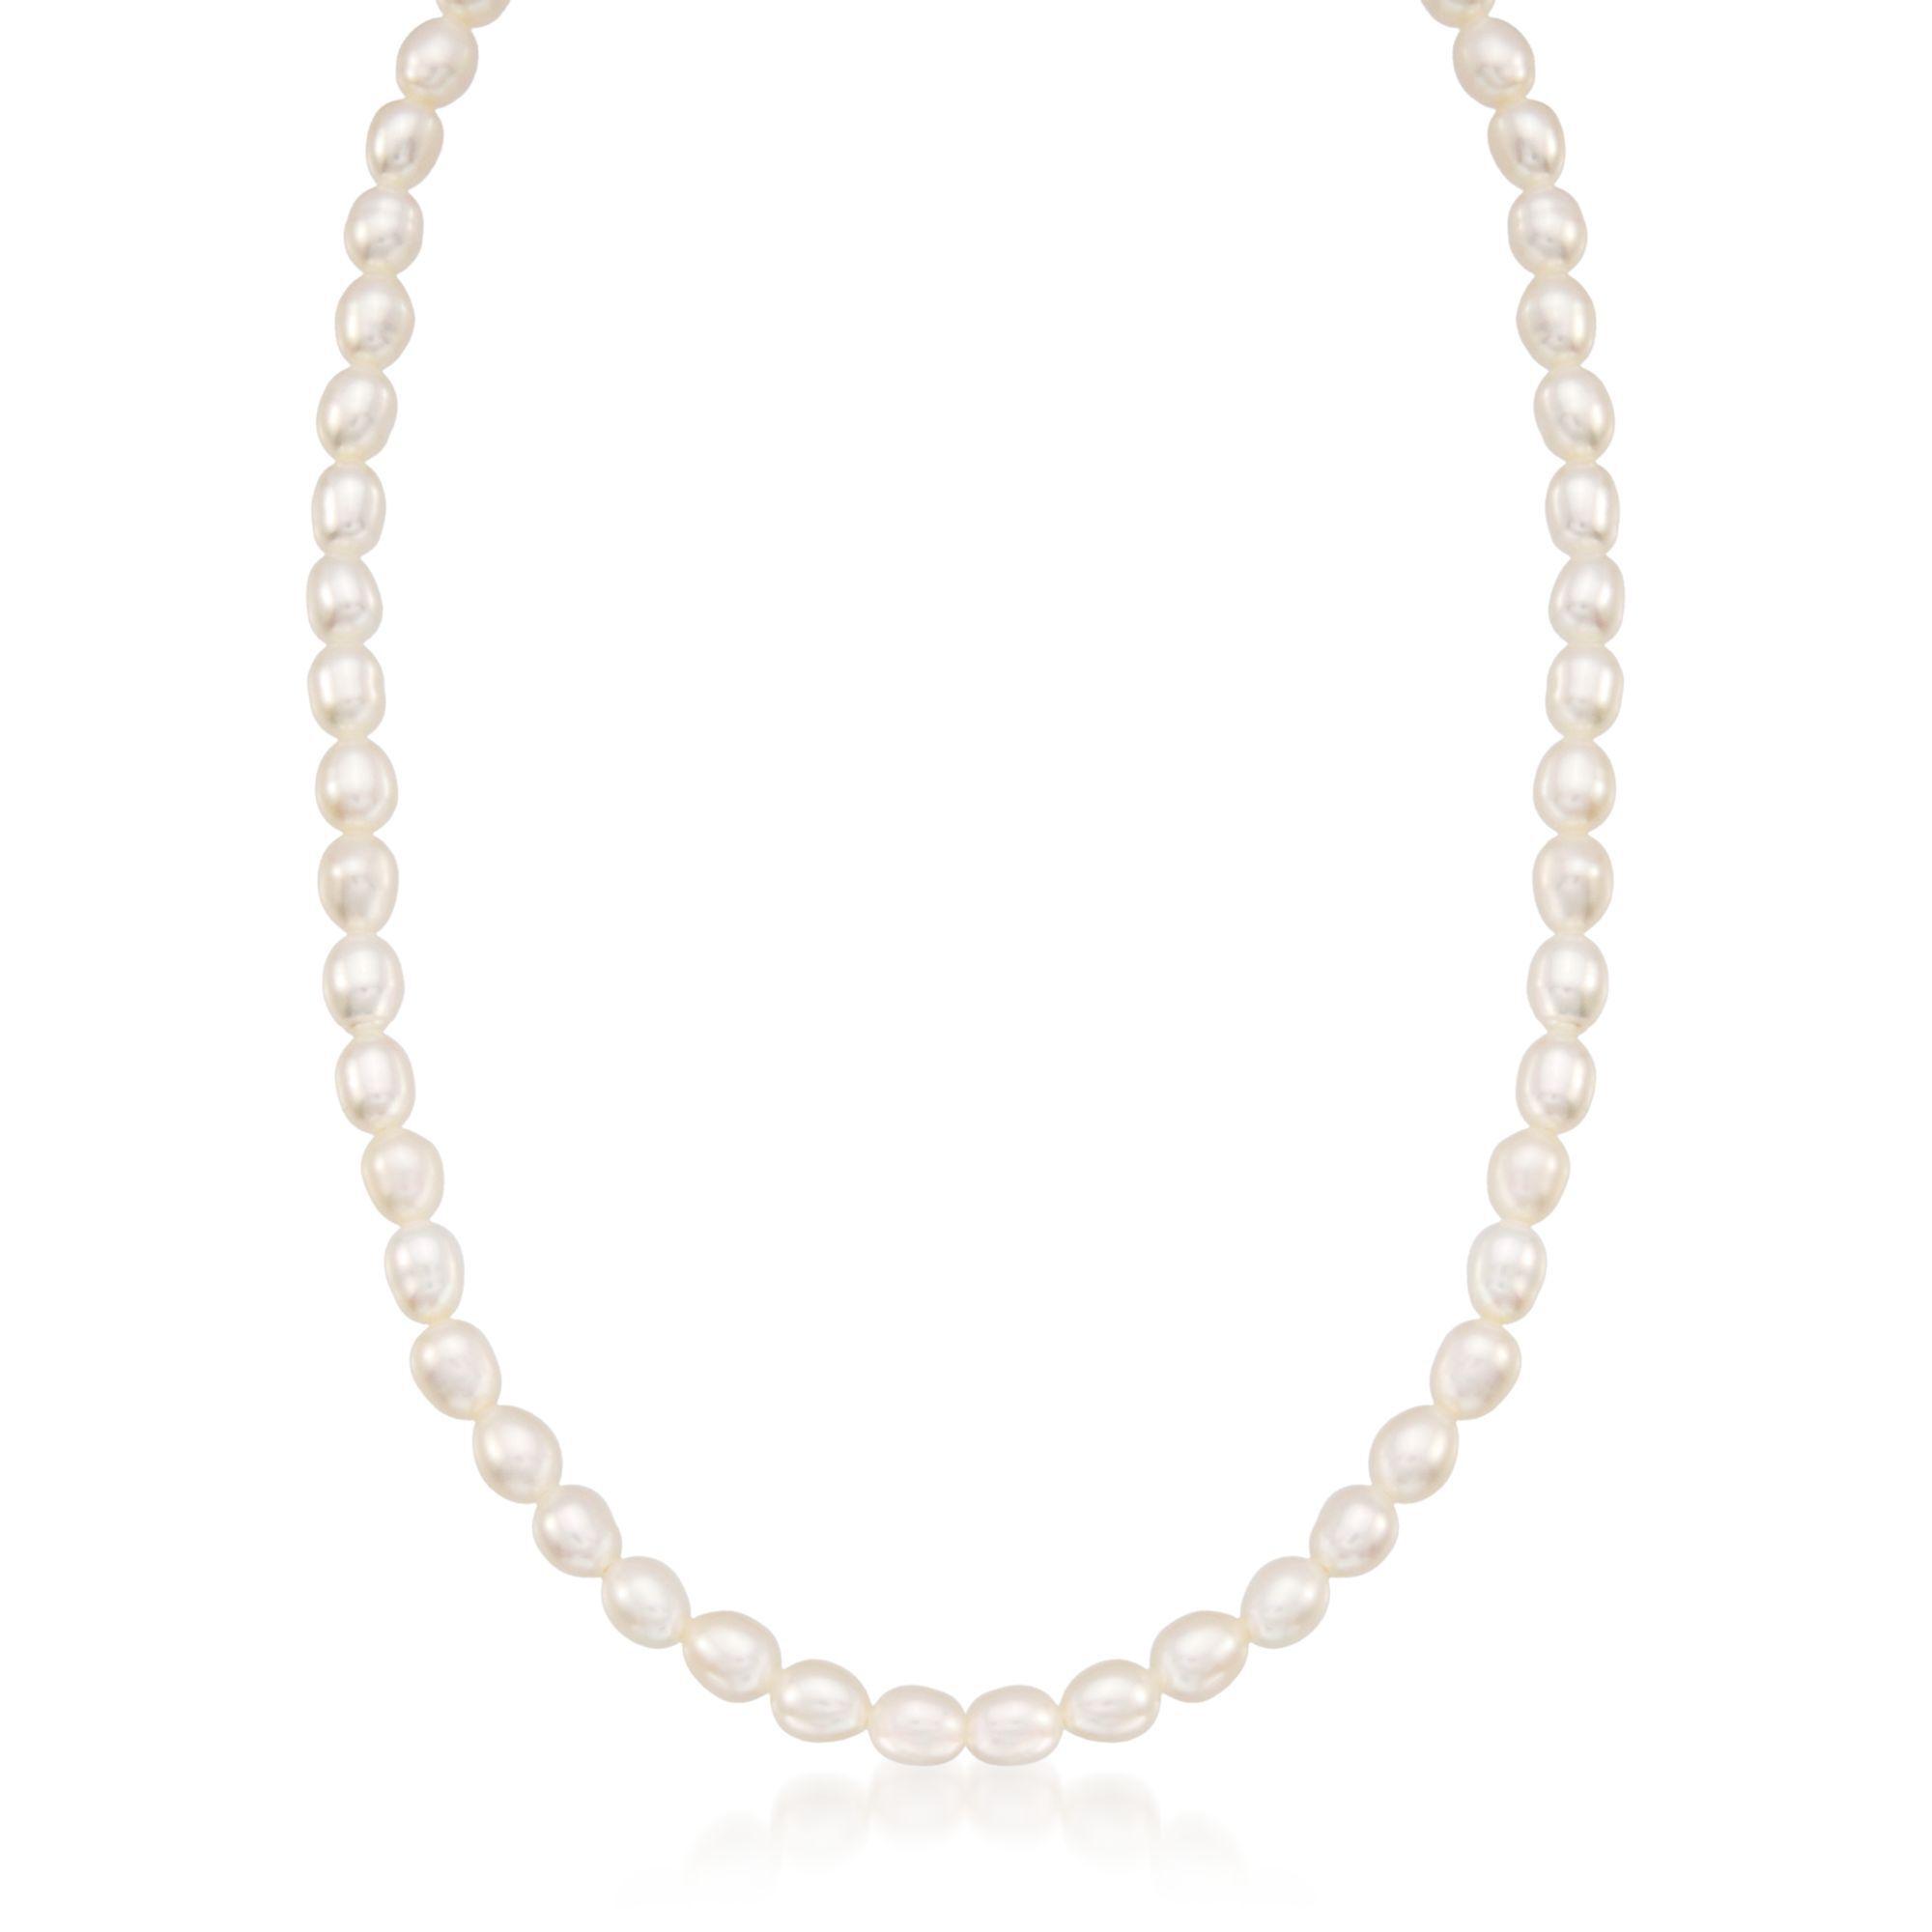 6 14k Yellow Gold 4-4.5mm Girls White Freshwater Cultured Pearl Bracelet